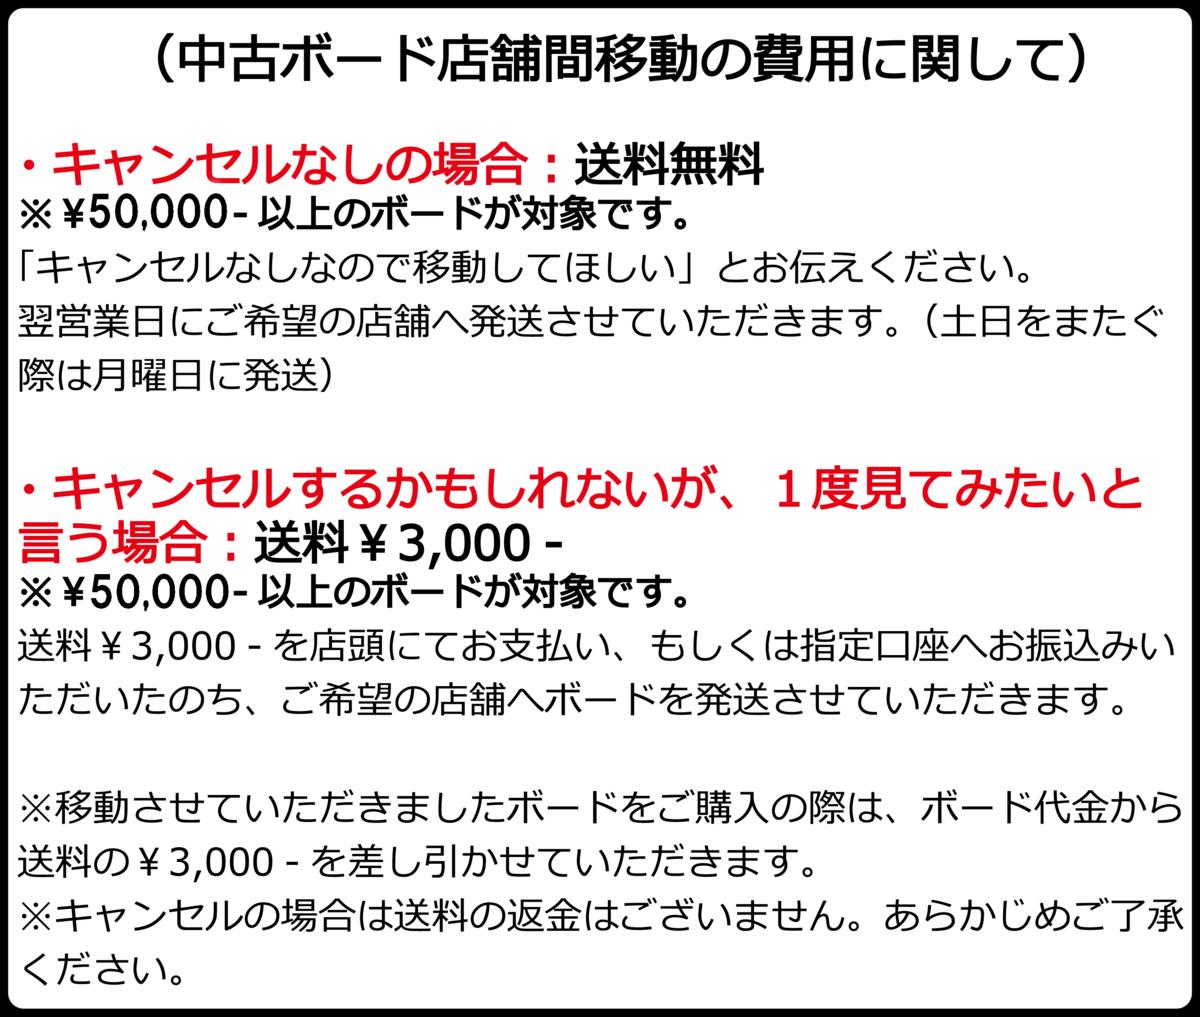 f:id:SEAKONG:20200123155553p:plain